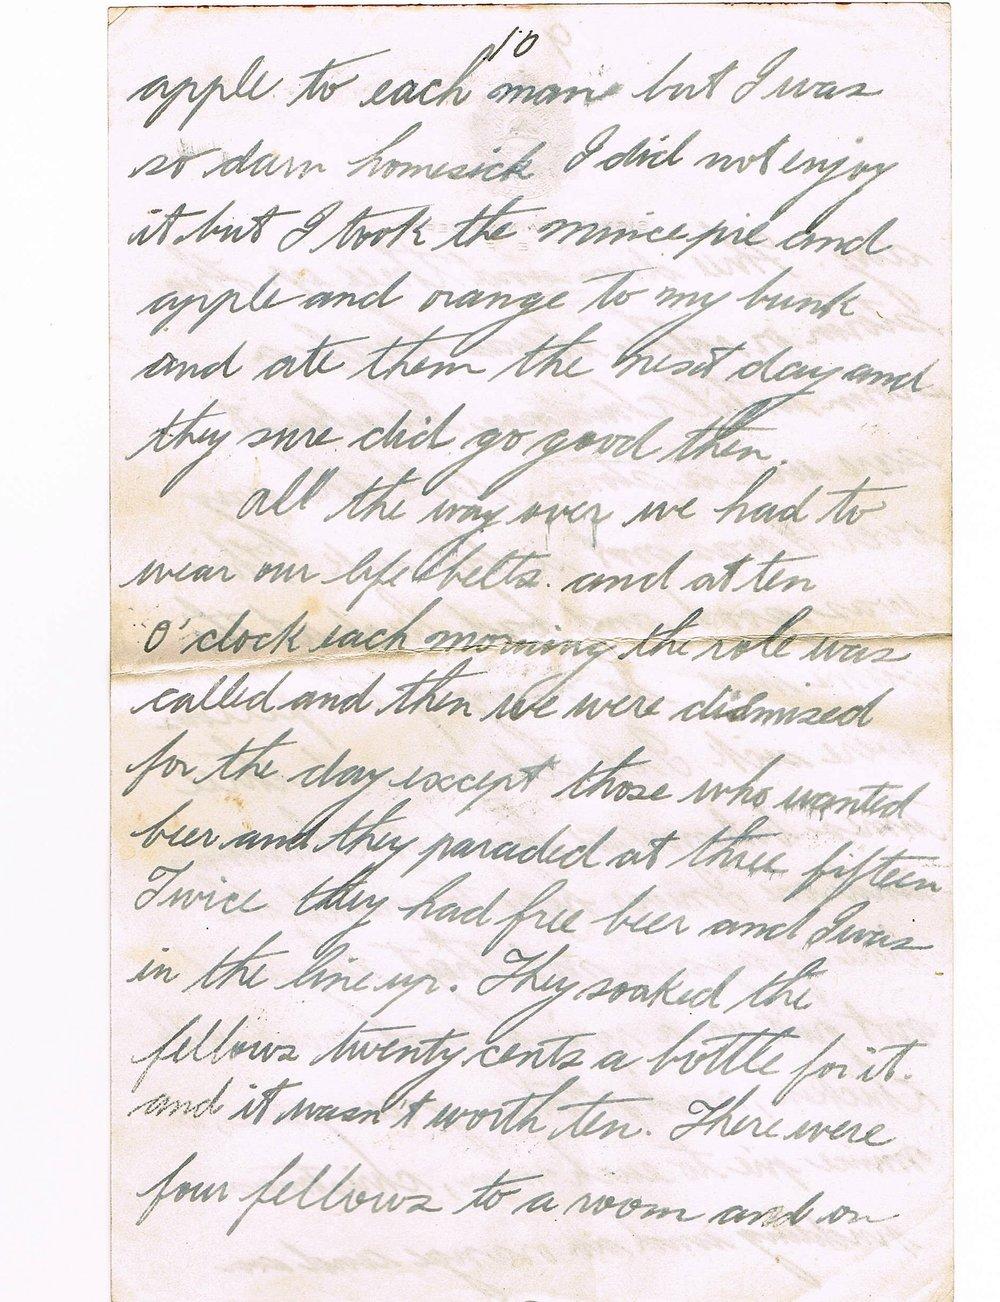 Basil Vale January 2, 1918 letter - page 10.jpg